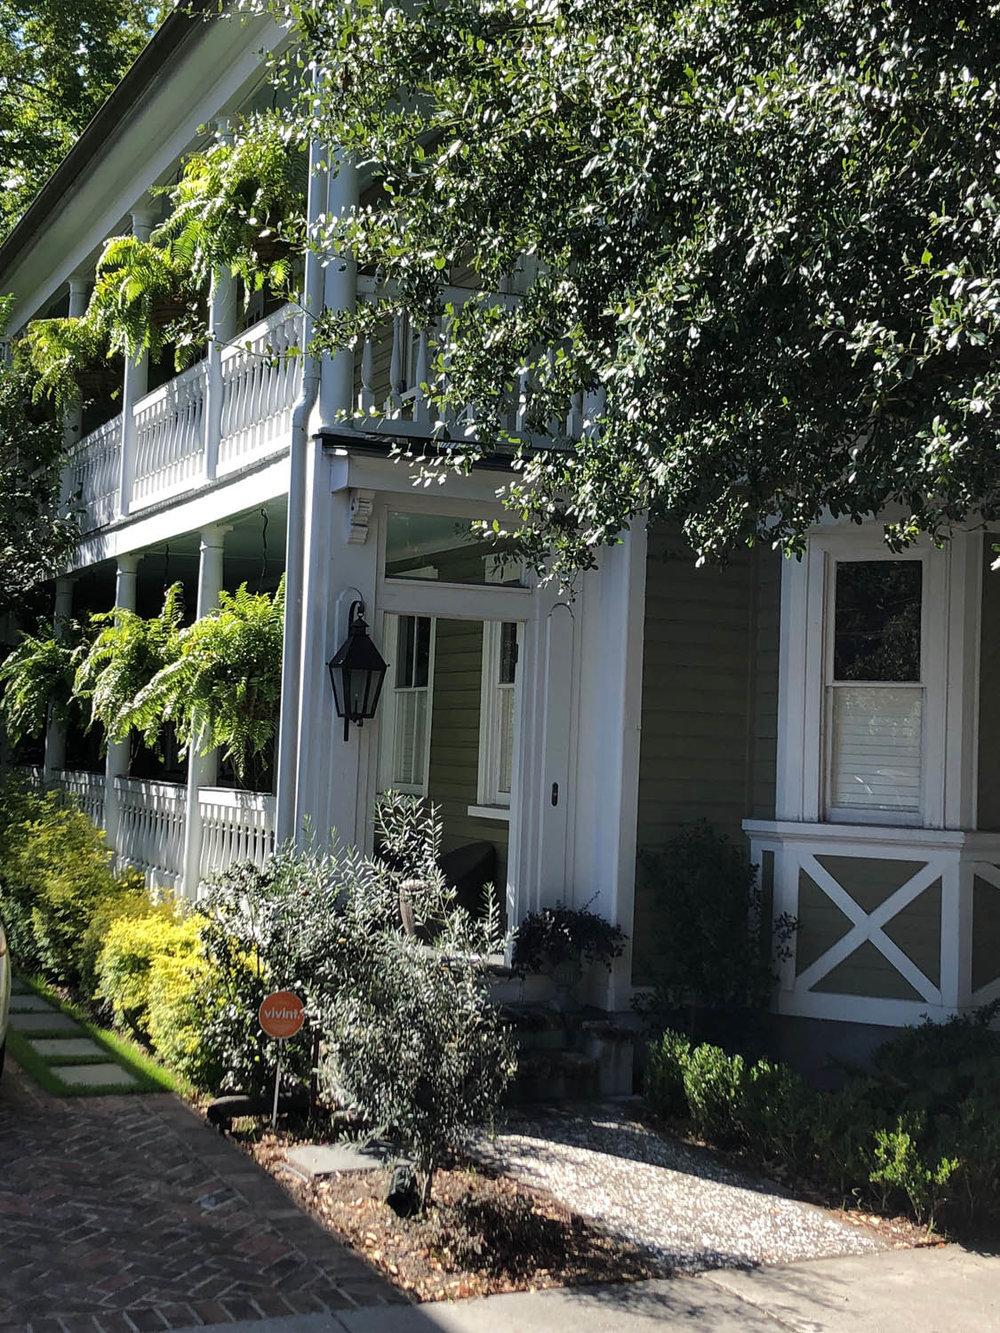 hospitality porch door on Charleston house